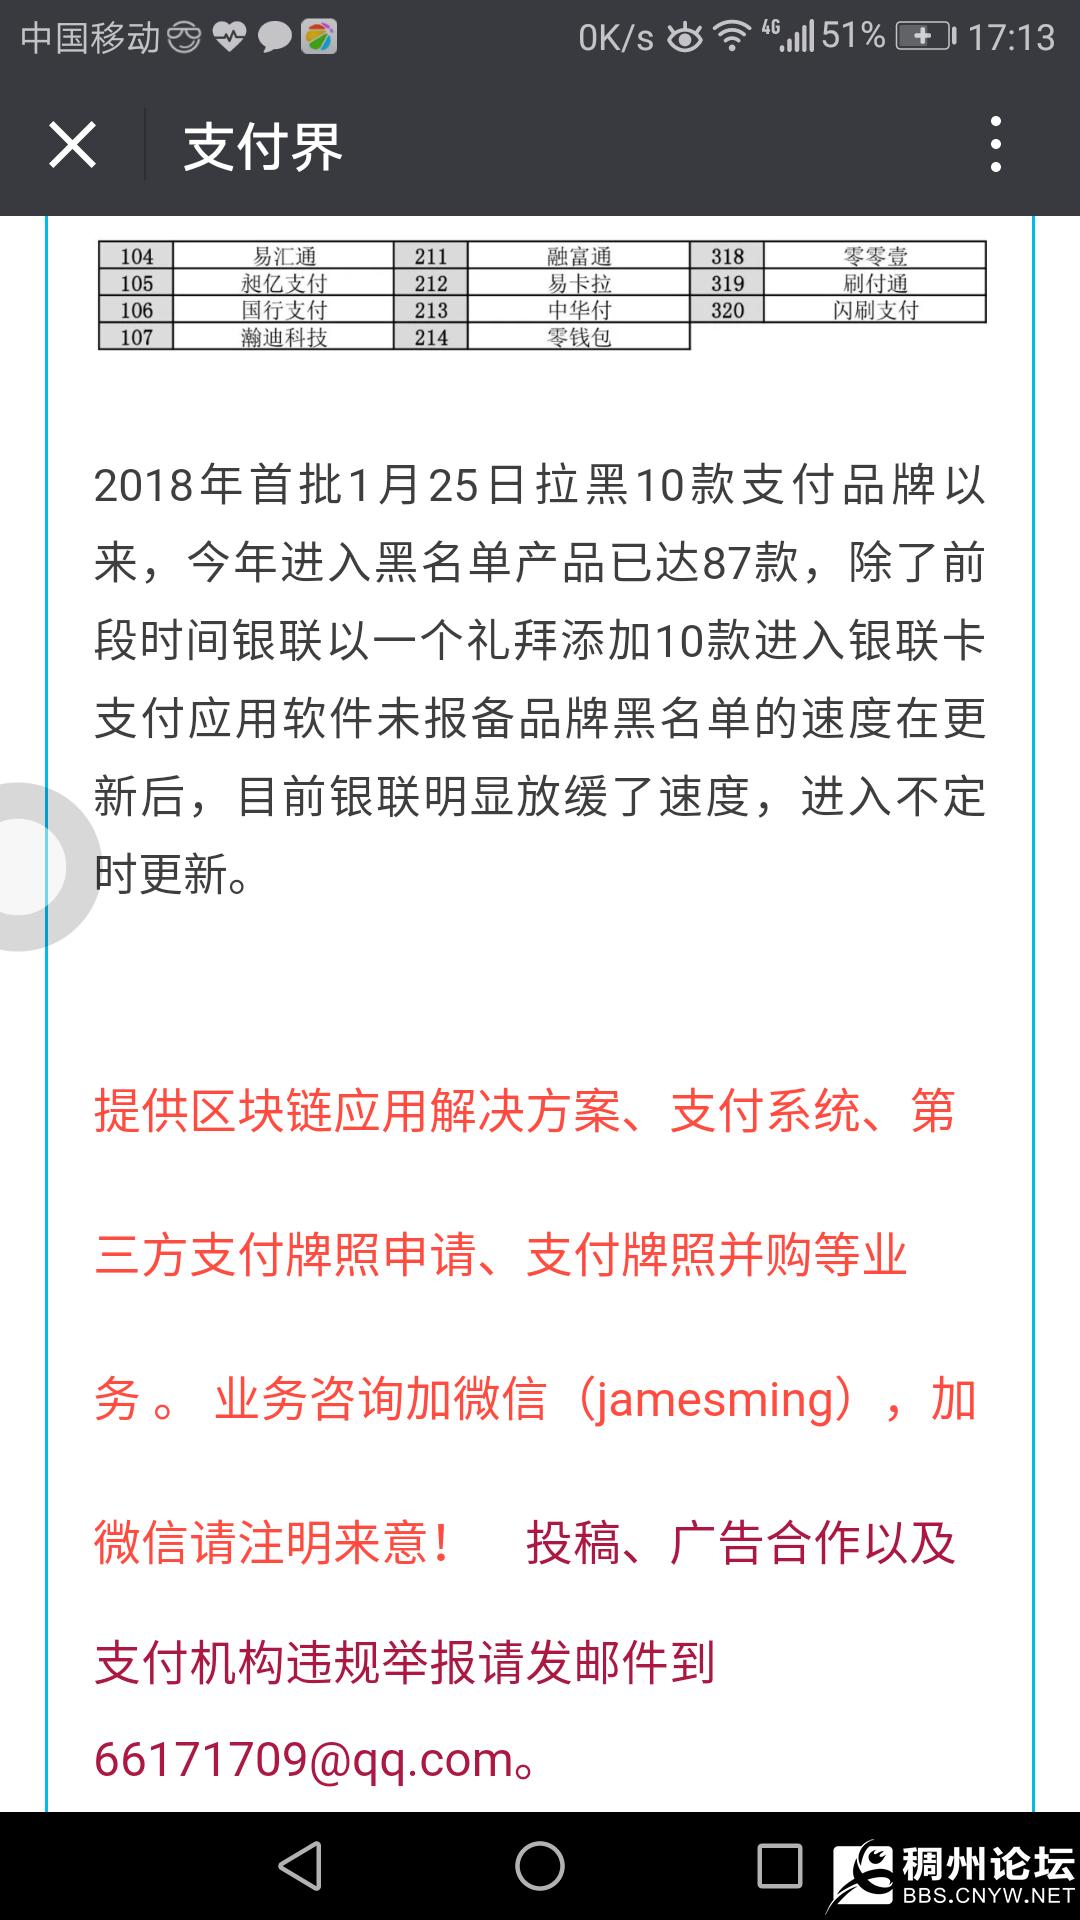 Screenshot_20180416-171332.png